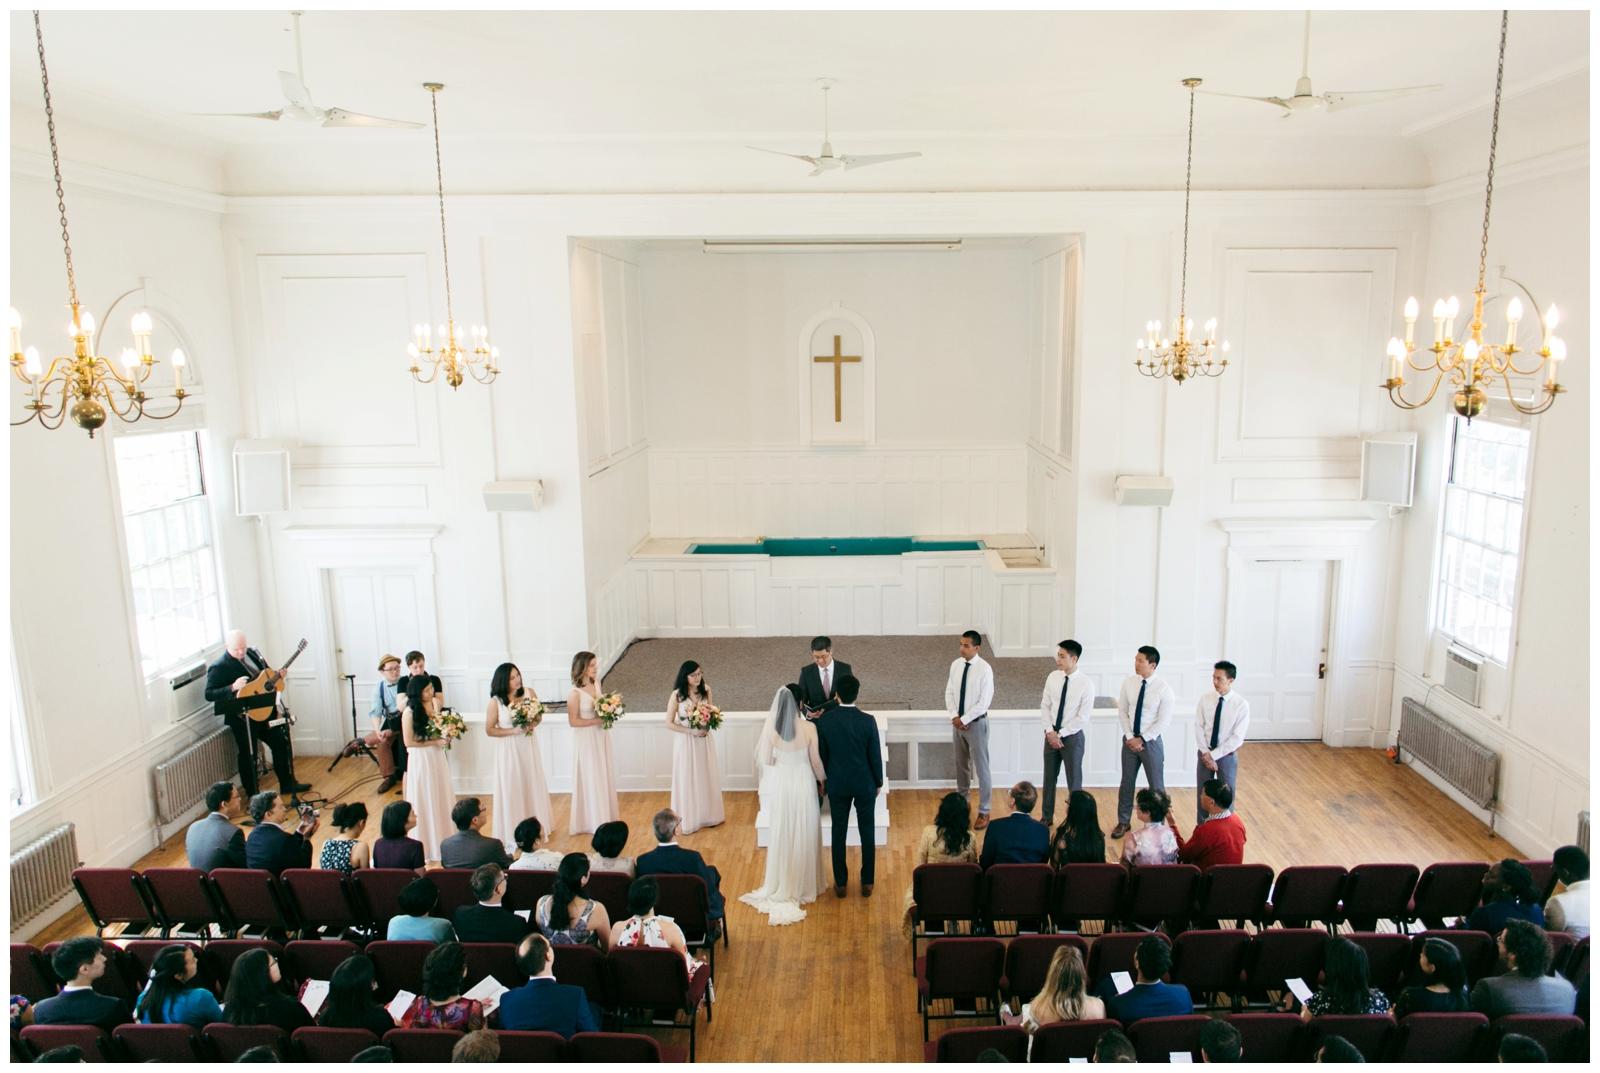 Samberg-Conference-Center-Boston-Wedding-Photographer-Bailey-Q-Photo-048.jpg